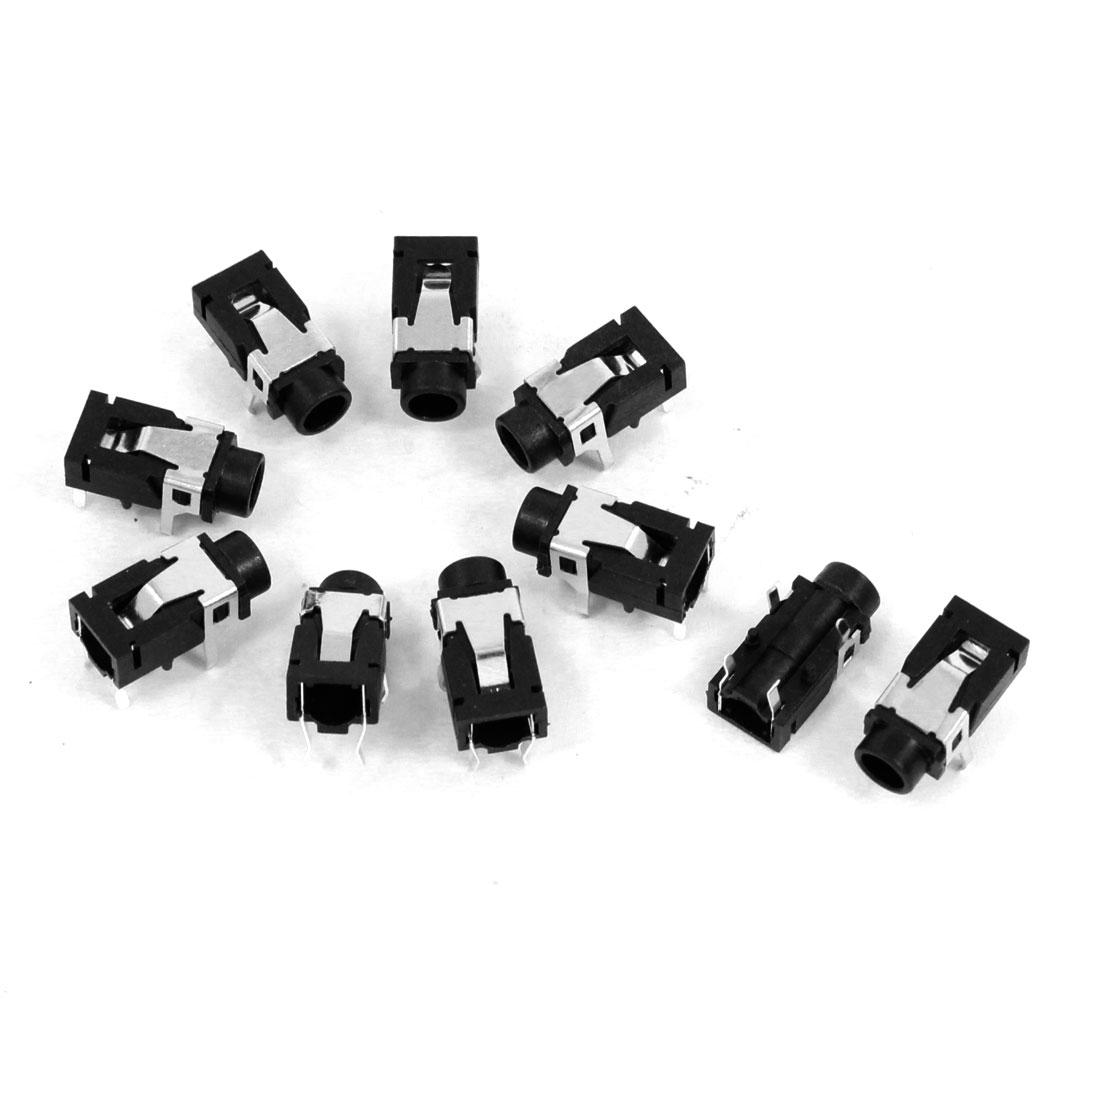 10 Pcs 4 Pin 3.5mm Stereo Jack Power Socket PCB Panel Mount for Headphone Earphone